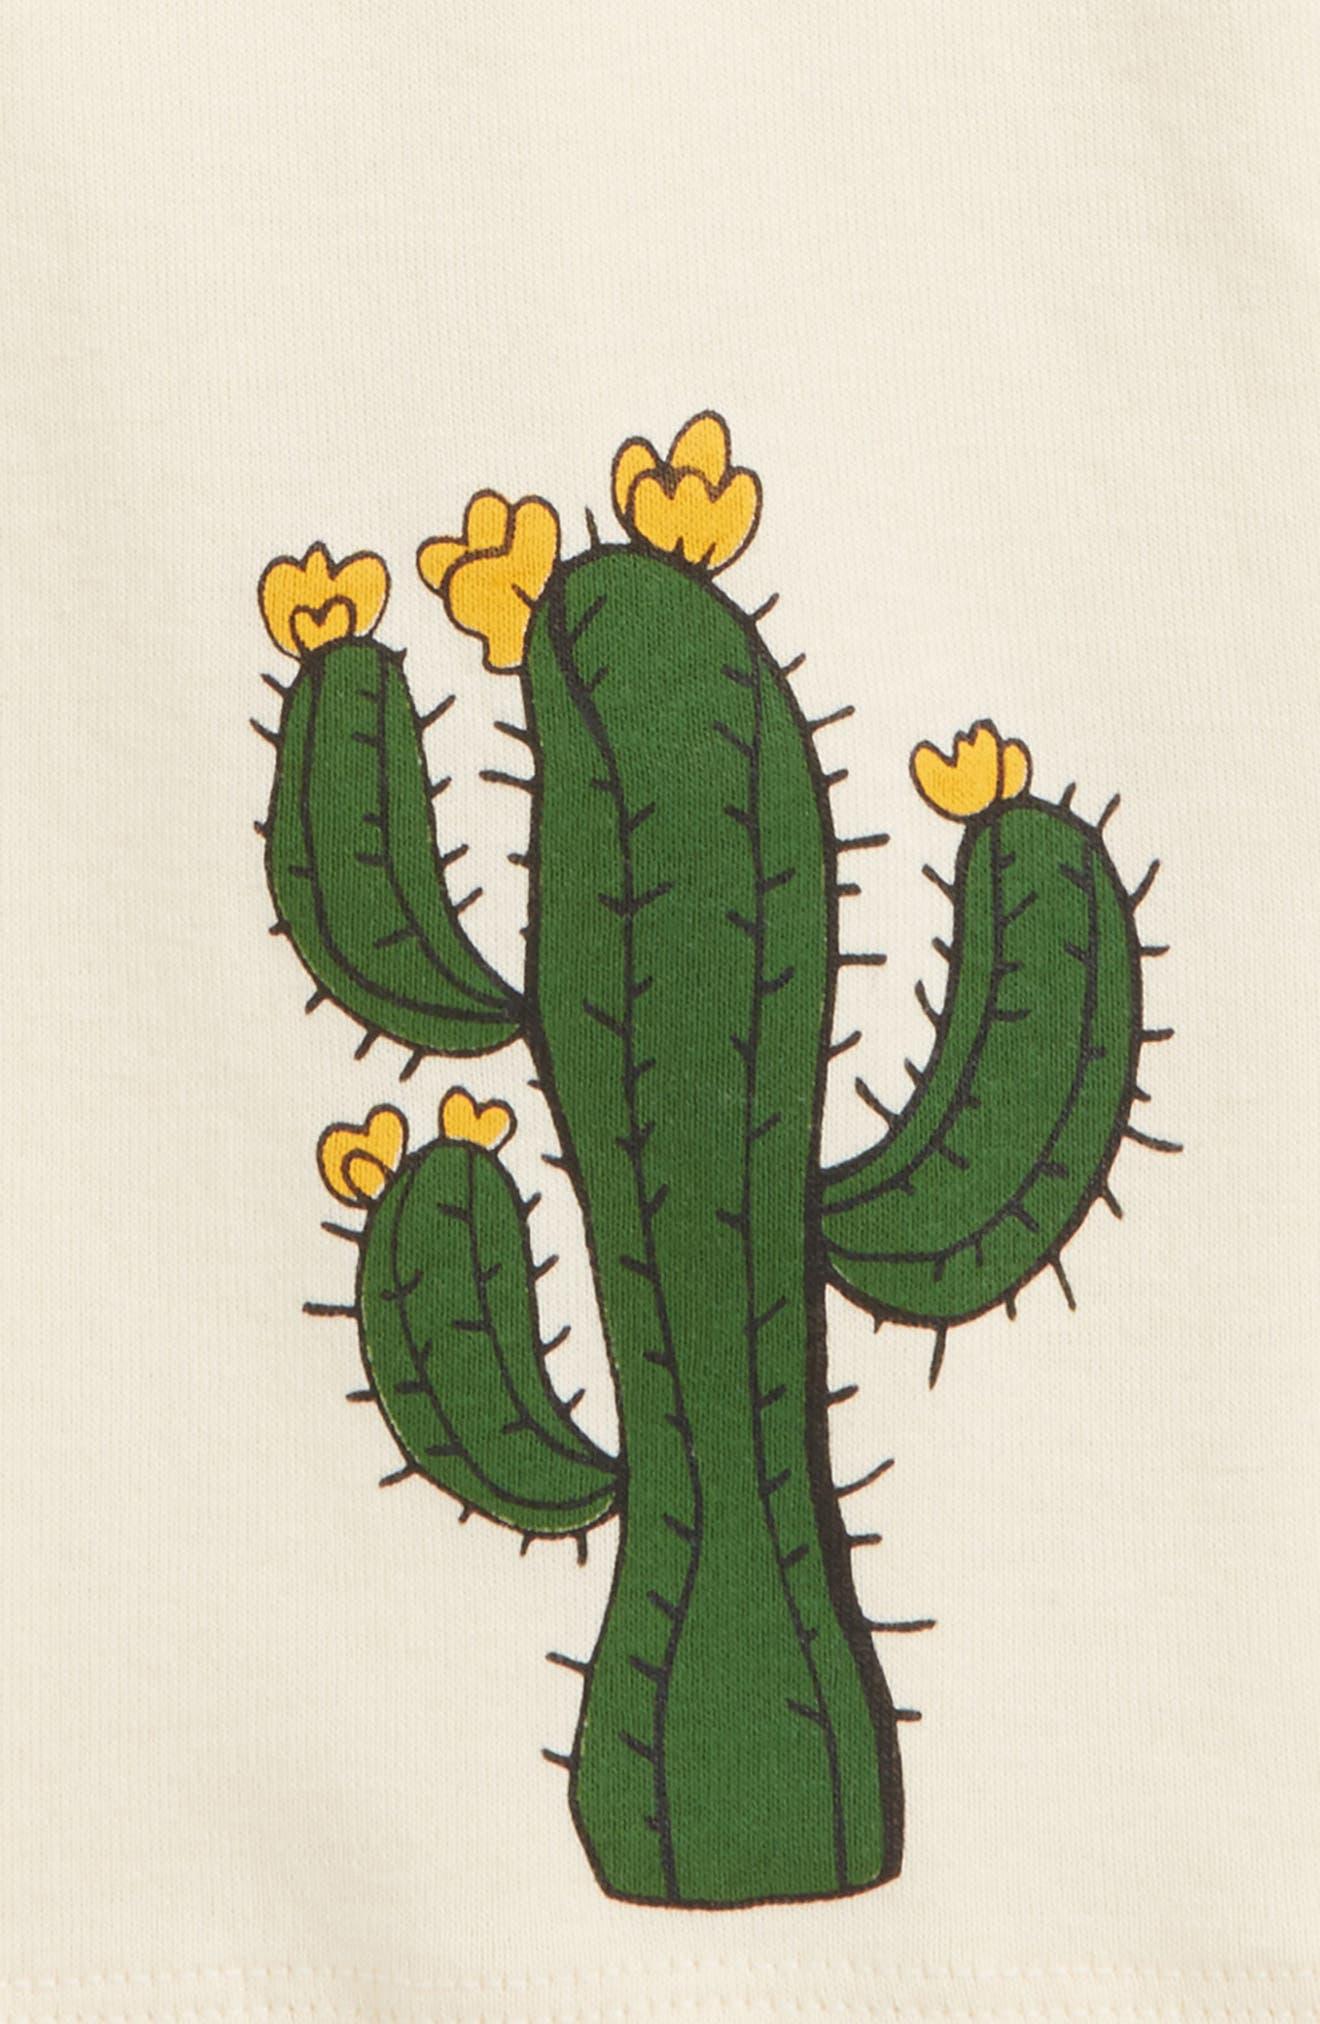 Cactus Organic Cotton Tank,                             Alternate thumbnail 2, color,                             901